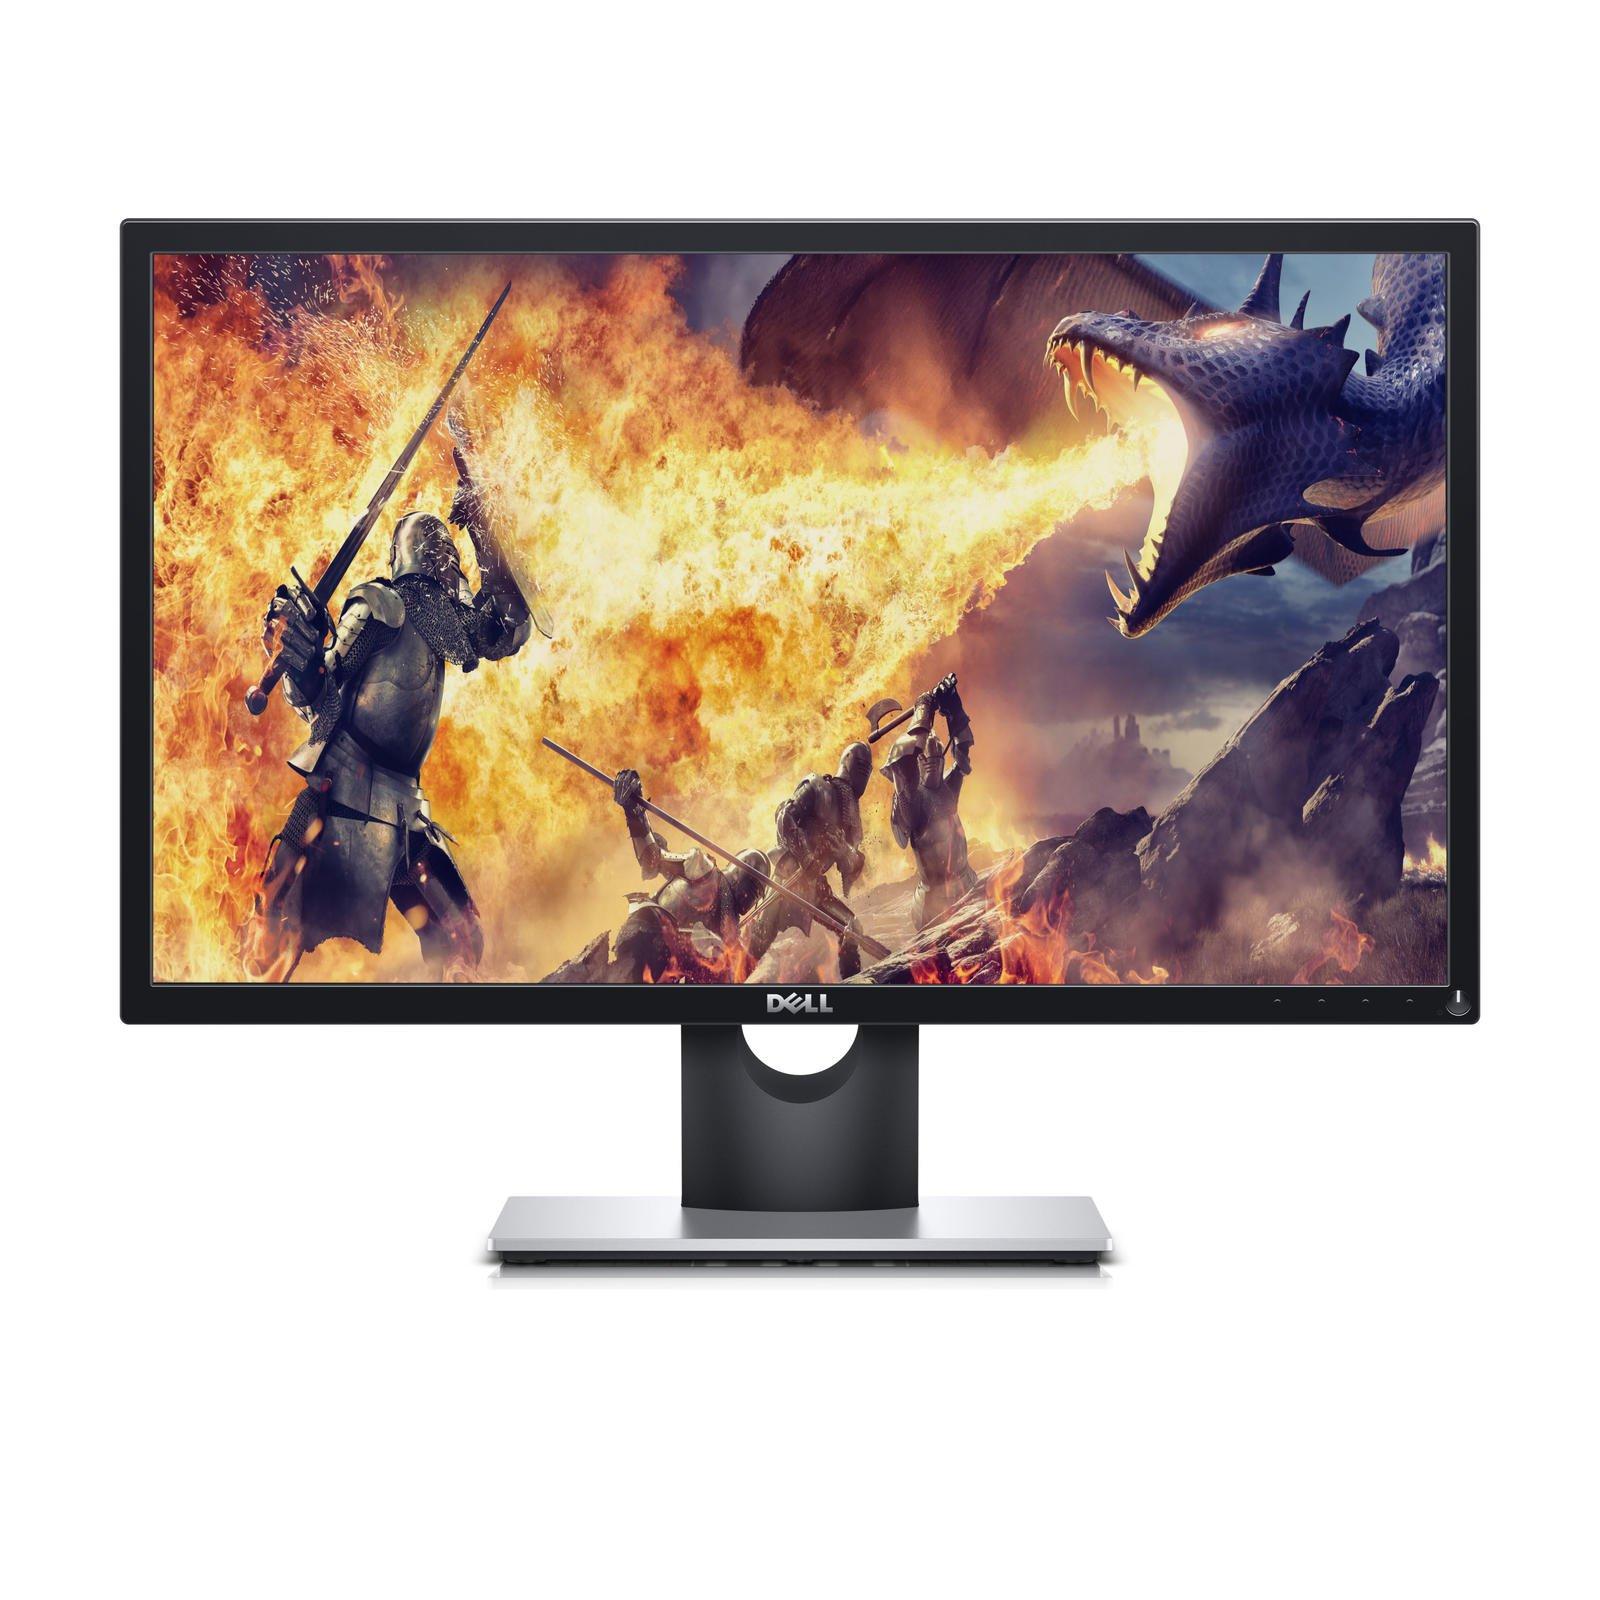 "Dell SE2417HGX (23.6"", FHD, TN, FreeSync bis 75Hz, 2x HDMI 1.4, VGA, ohne VESA, 3J Garantie)"